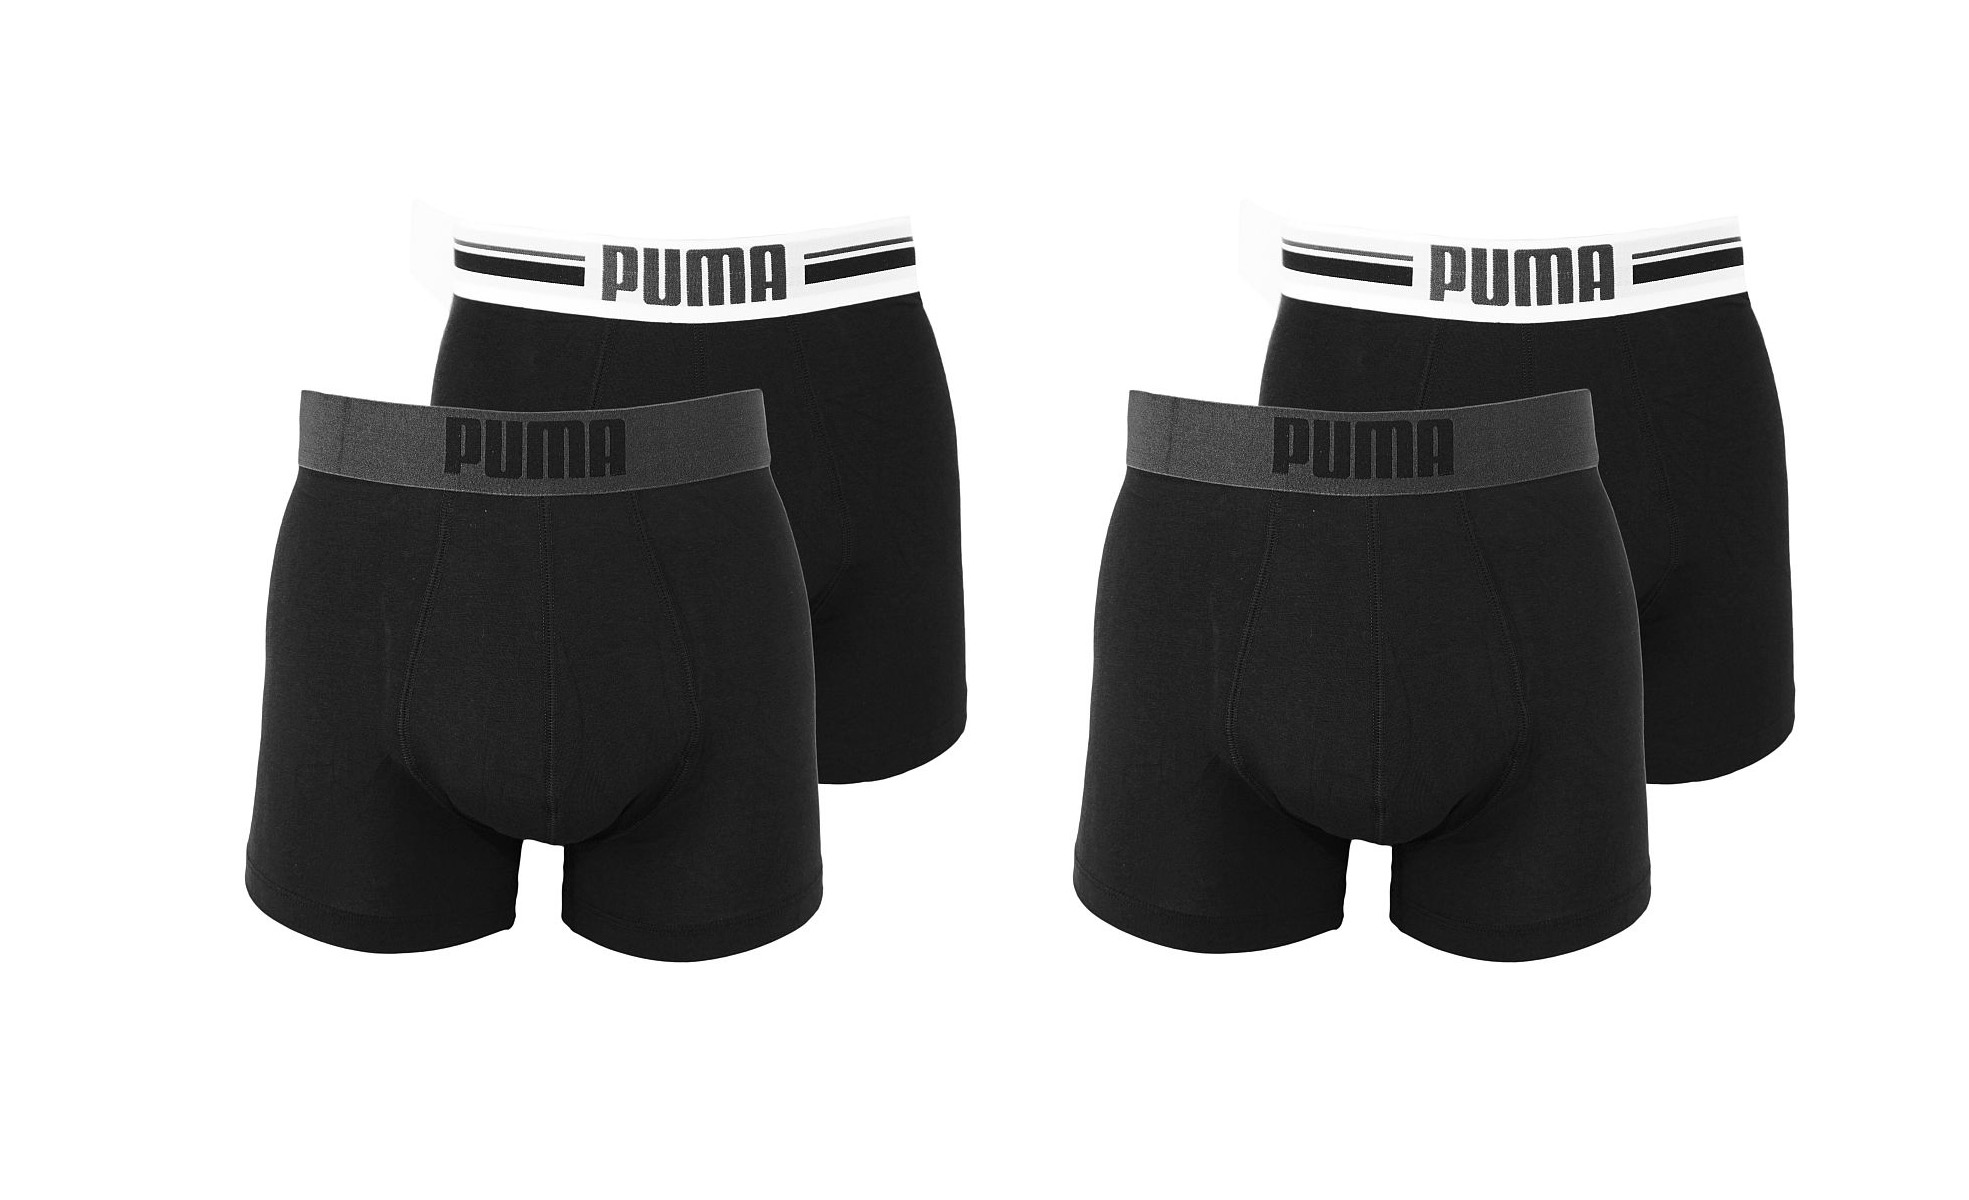 PUMA Shorts Unterhosen 2 x 2er Pack Boxer 651003001 200 020 black SF17-PMS2